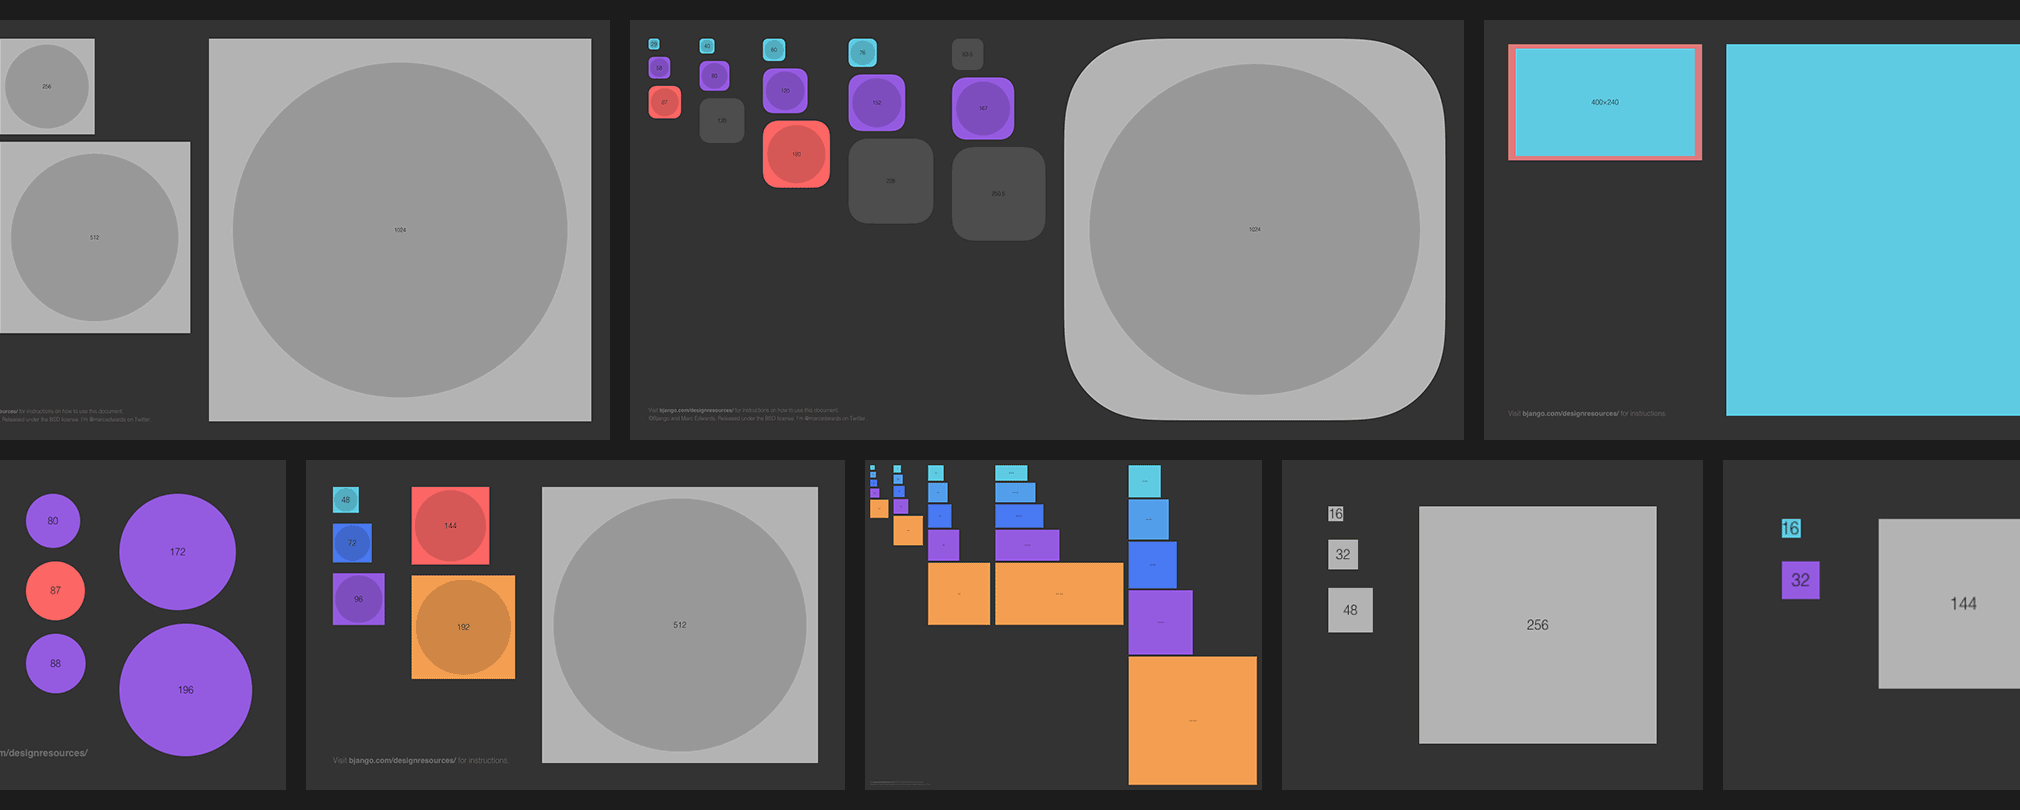 Bjango App Icon Templates    A comprehensive set of app icon ...